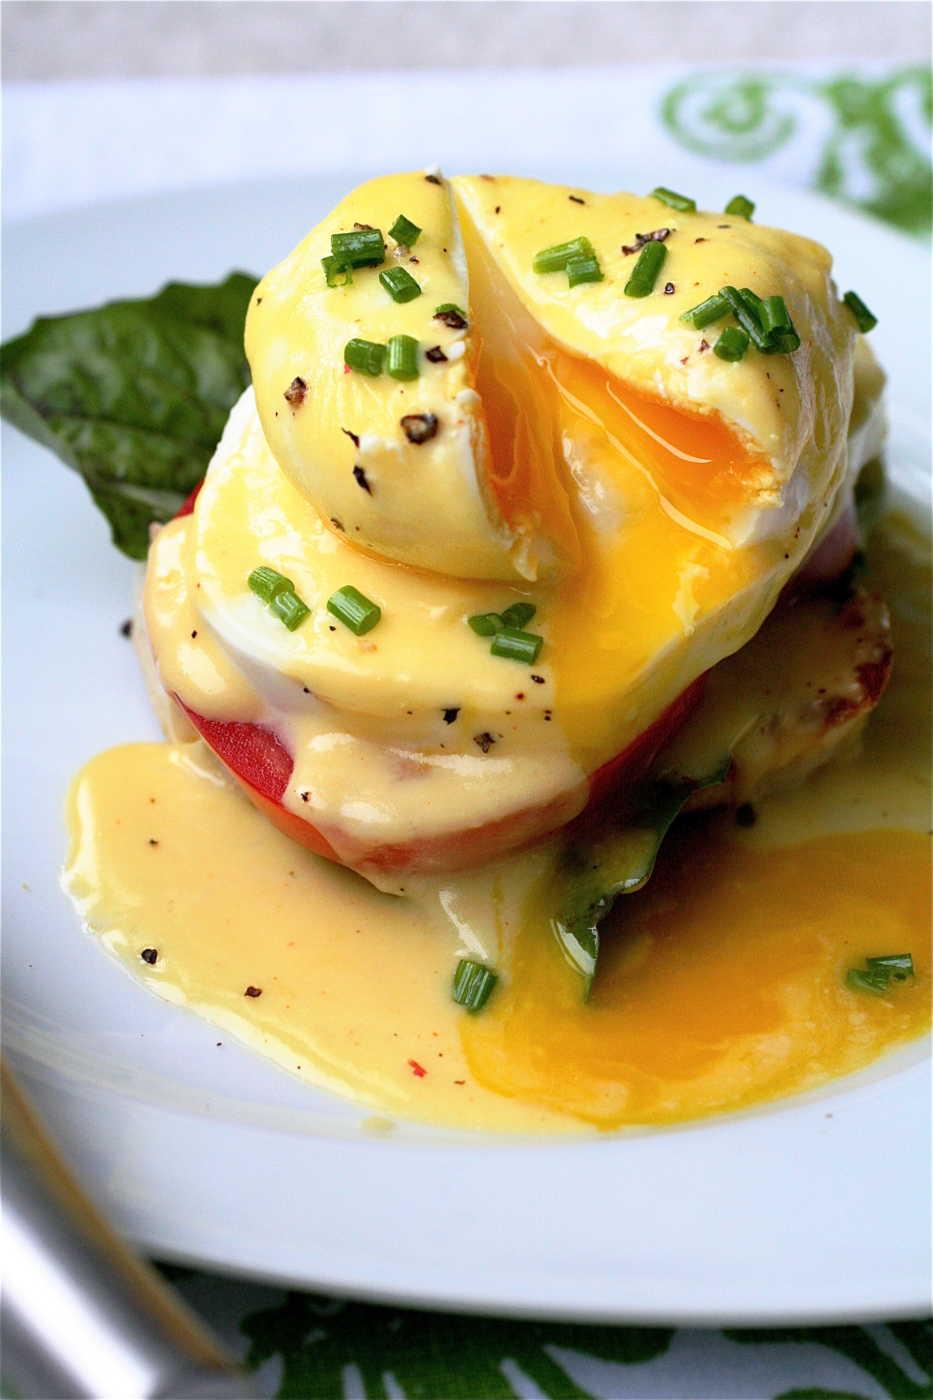 Eggs Benedict via Gizmodo